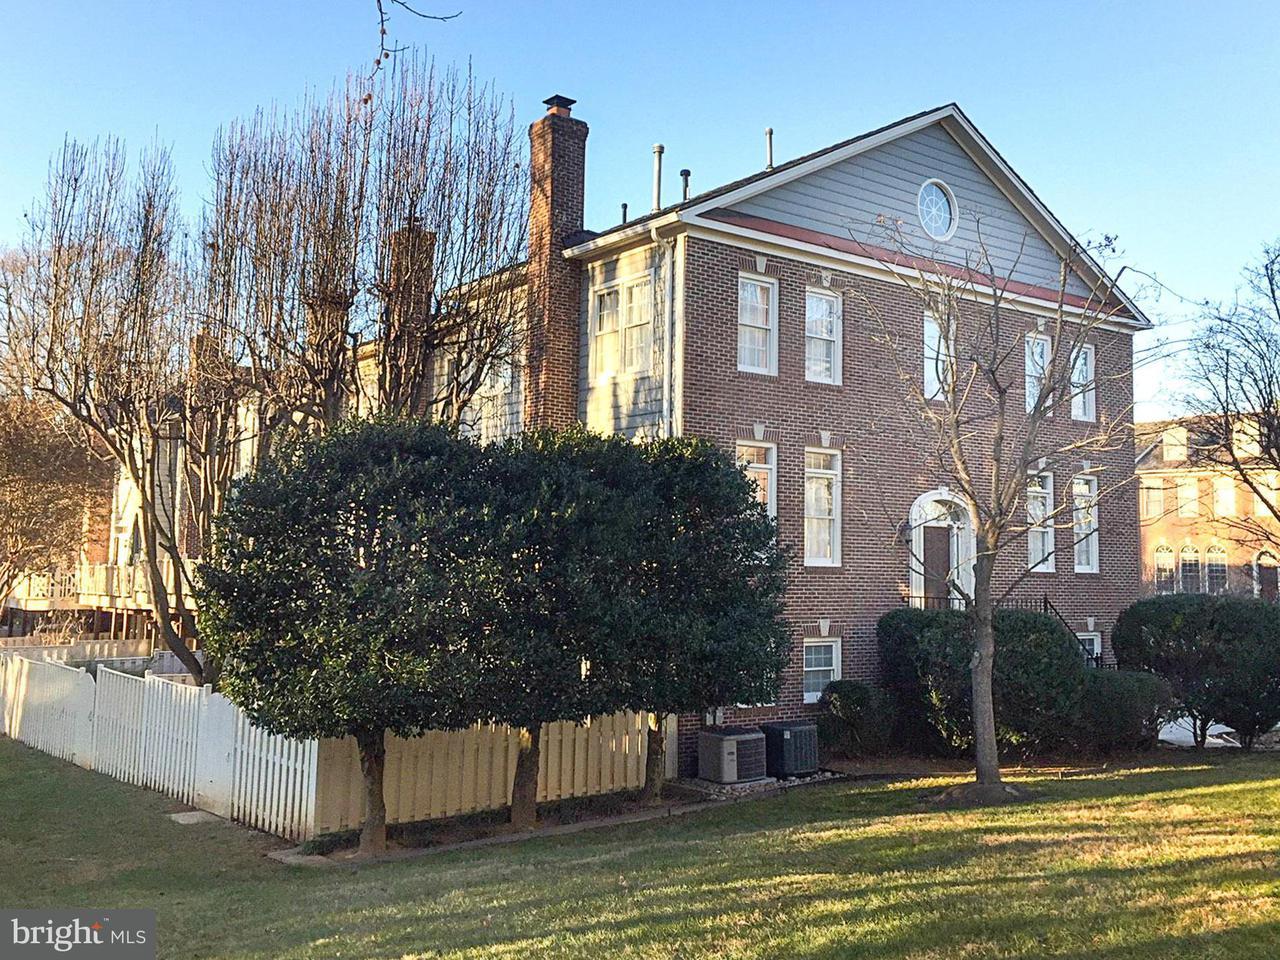 Townhouse for Sale at 10151 CASTLEWOOD Lane 10151 CASTLEWOOD Lane Oakton, Virginia 22124 United States